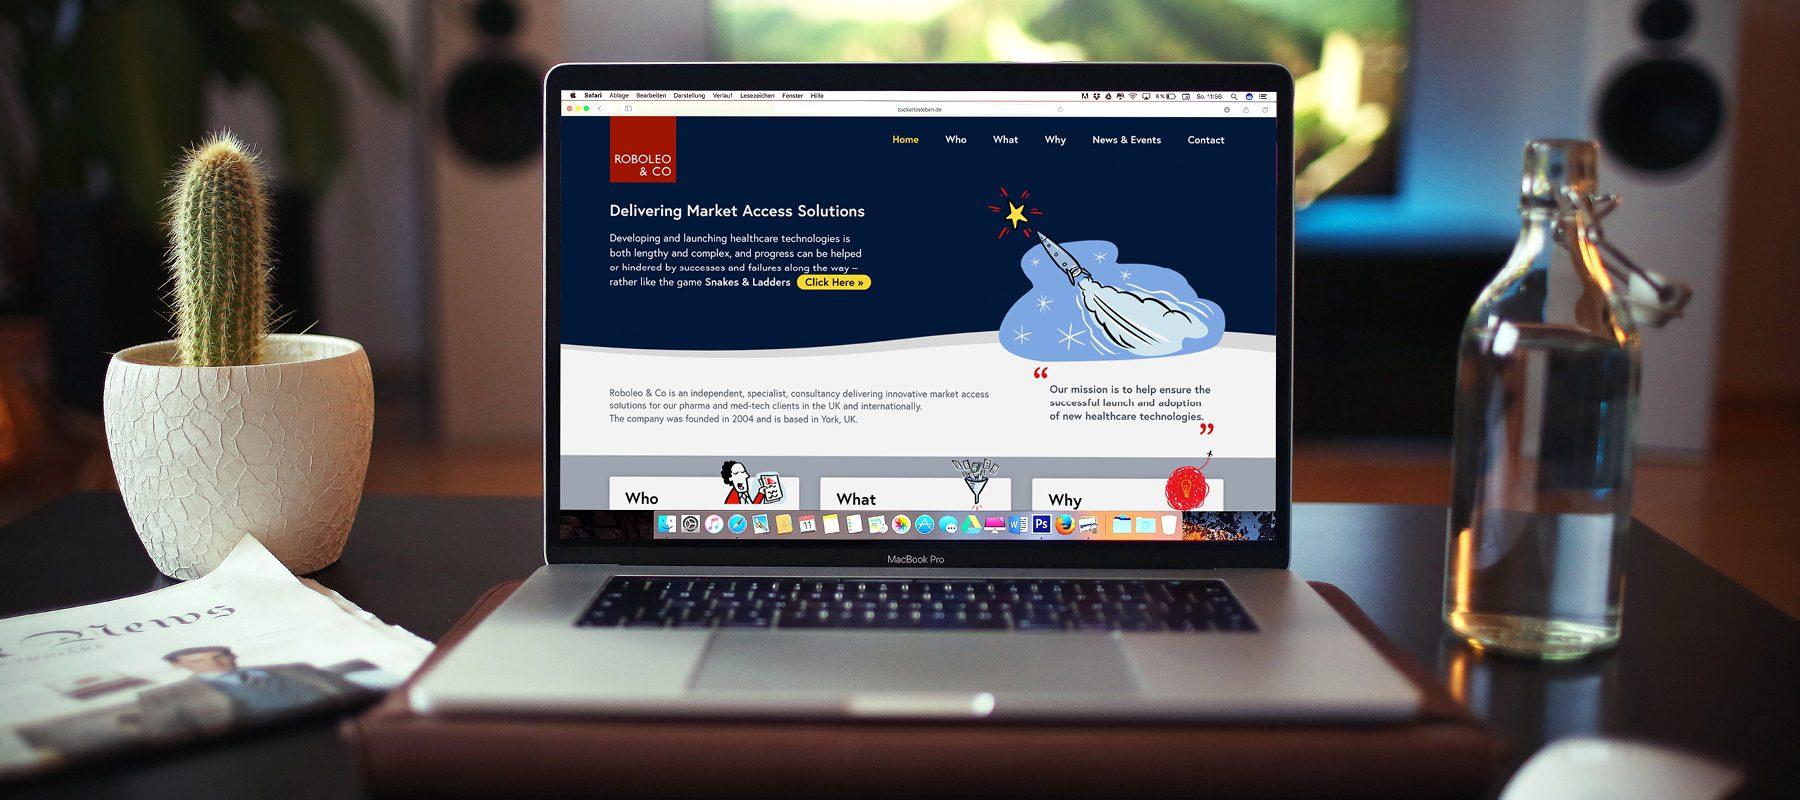 6 ways to improve your website homepage